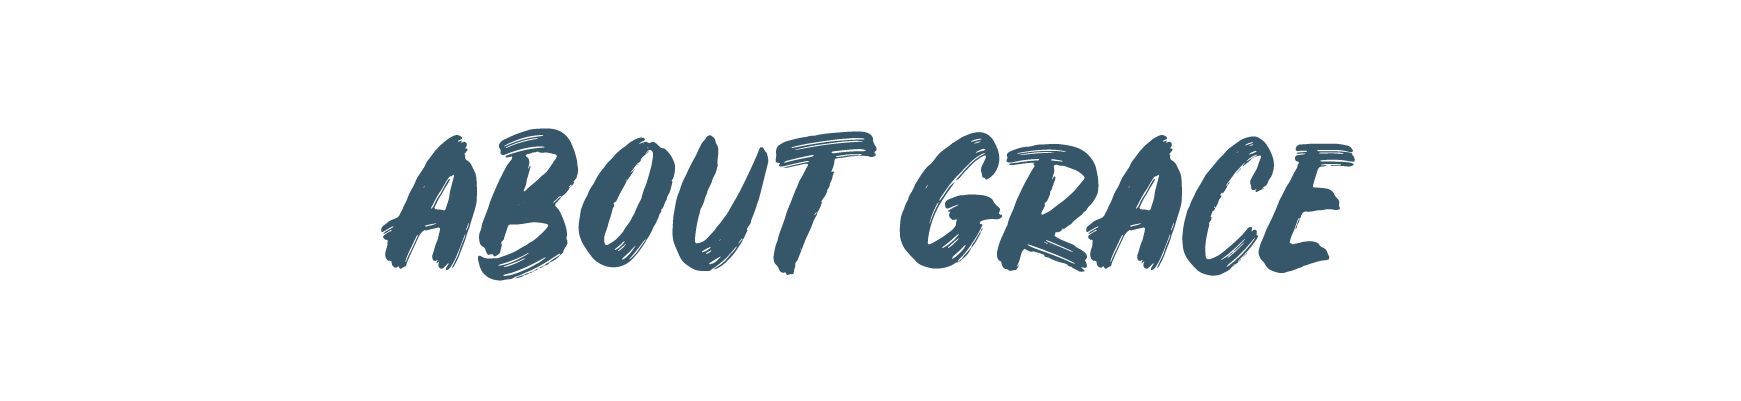 GR - Script Titles2-22.png